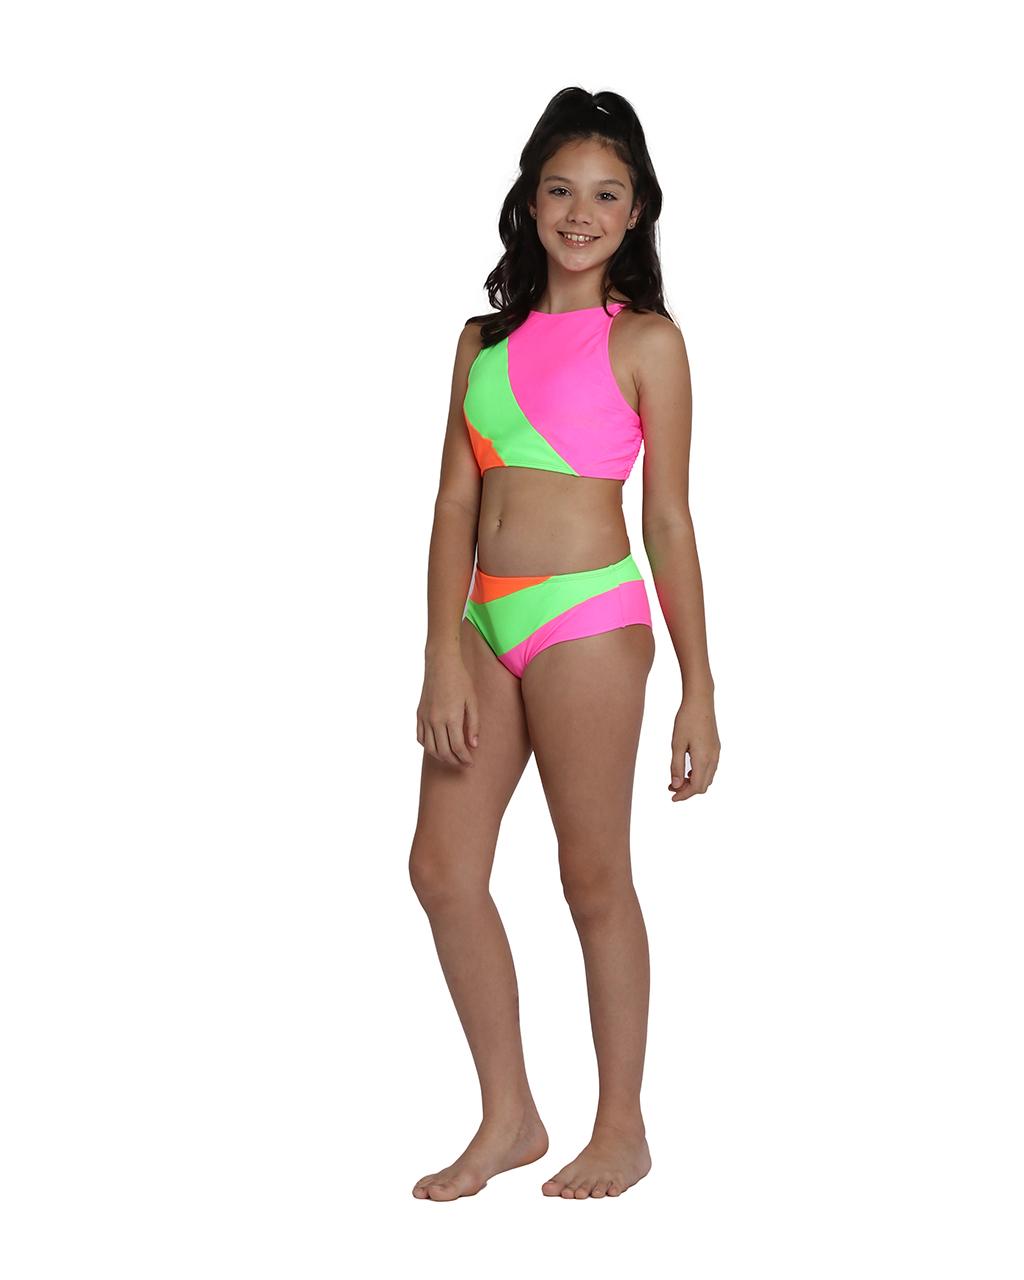 Biquini Teen Rosa Cropped e Calcinha Listras Verde e Laranja Siri